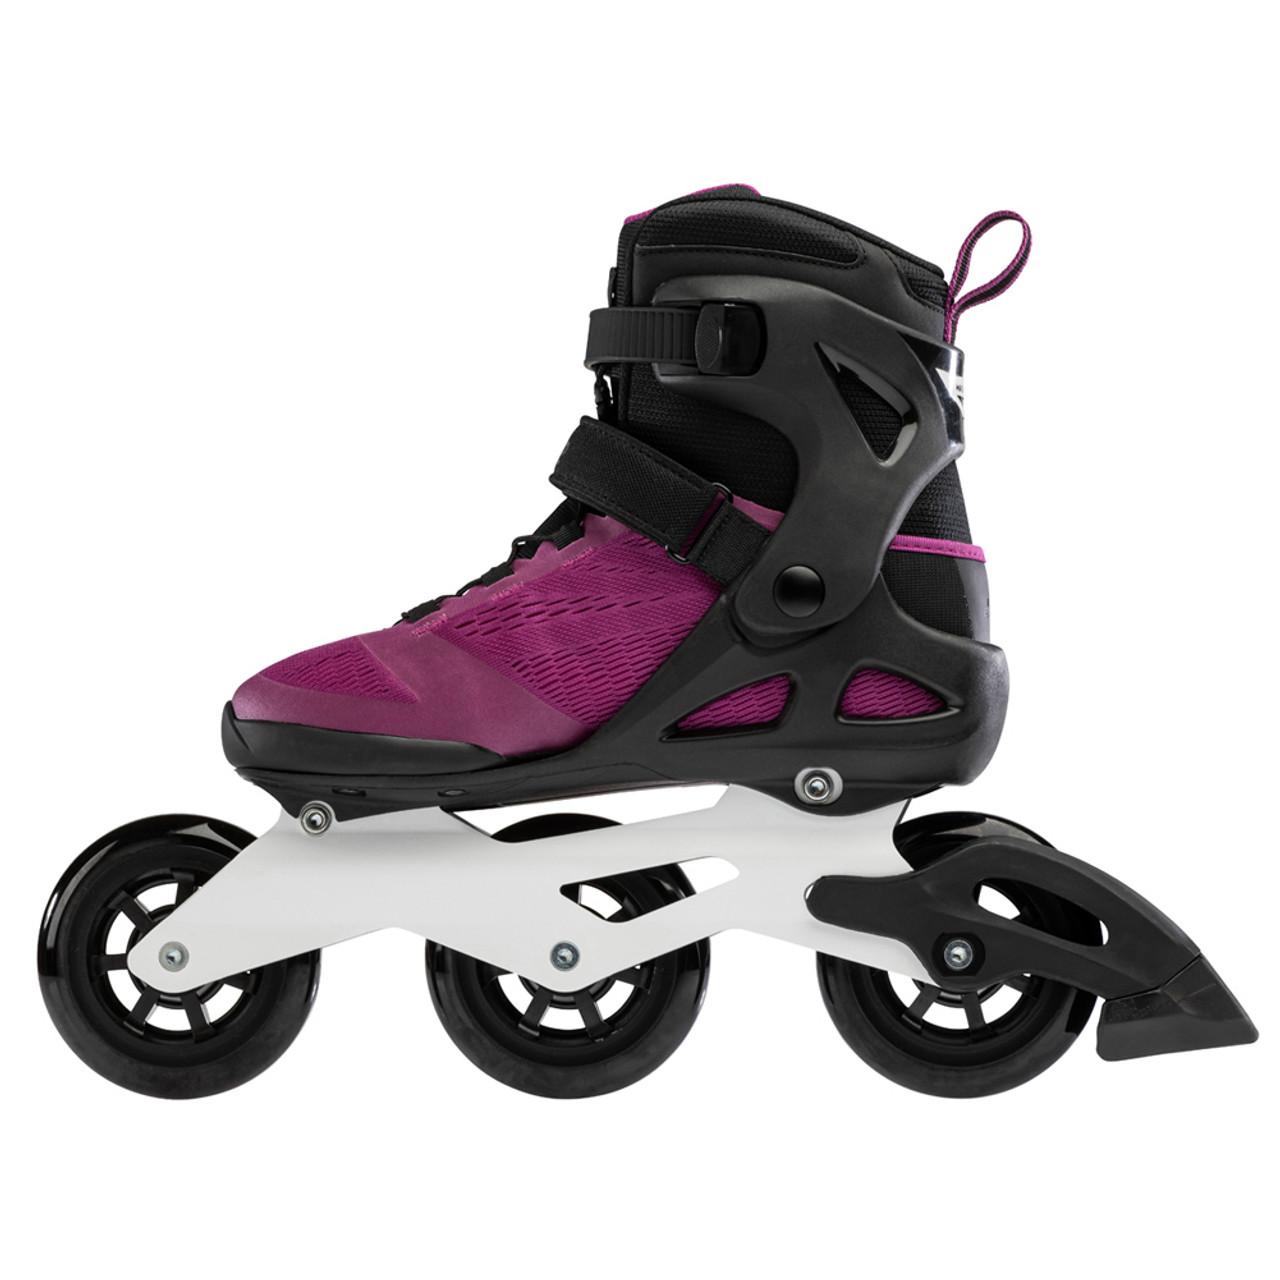 Violet//Black 275 Rollerblade Womens MACROBLADE 100 3WD W Inline Skates